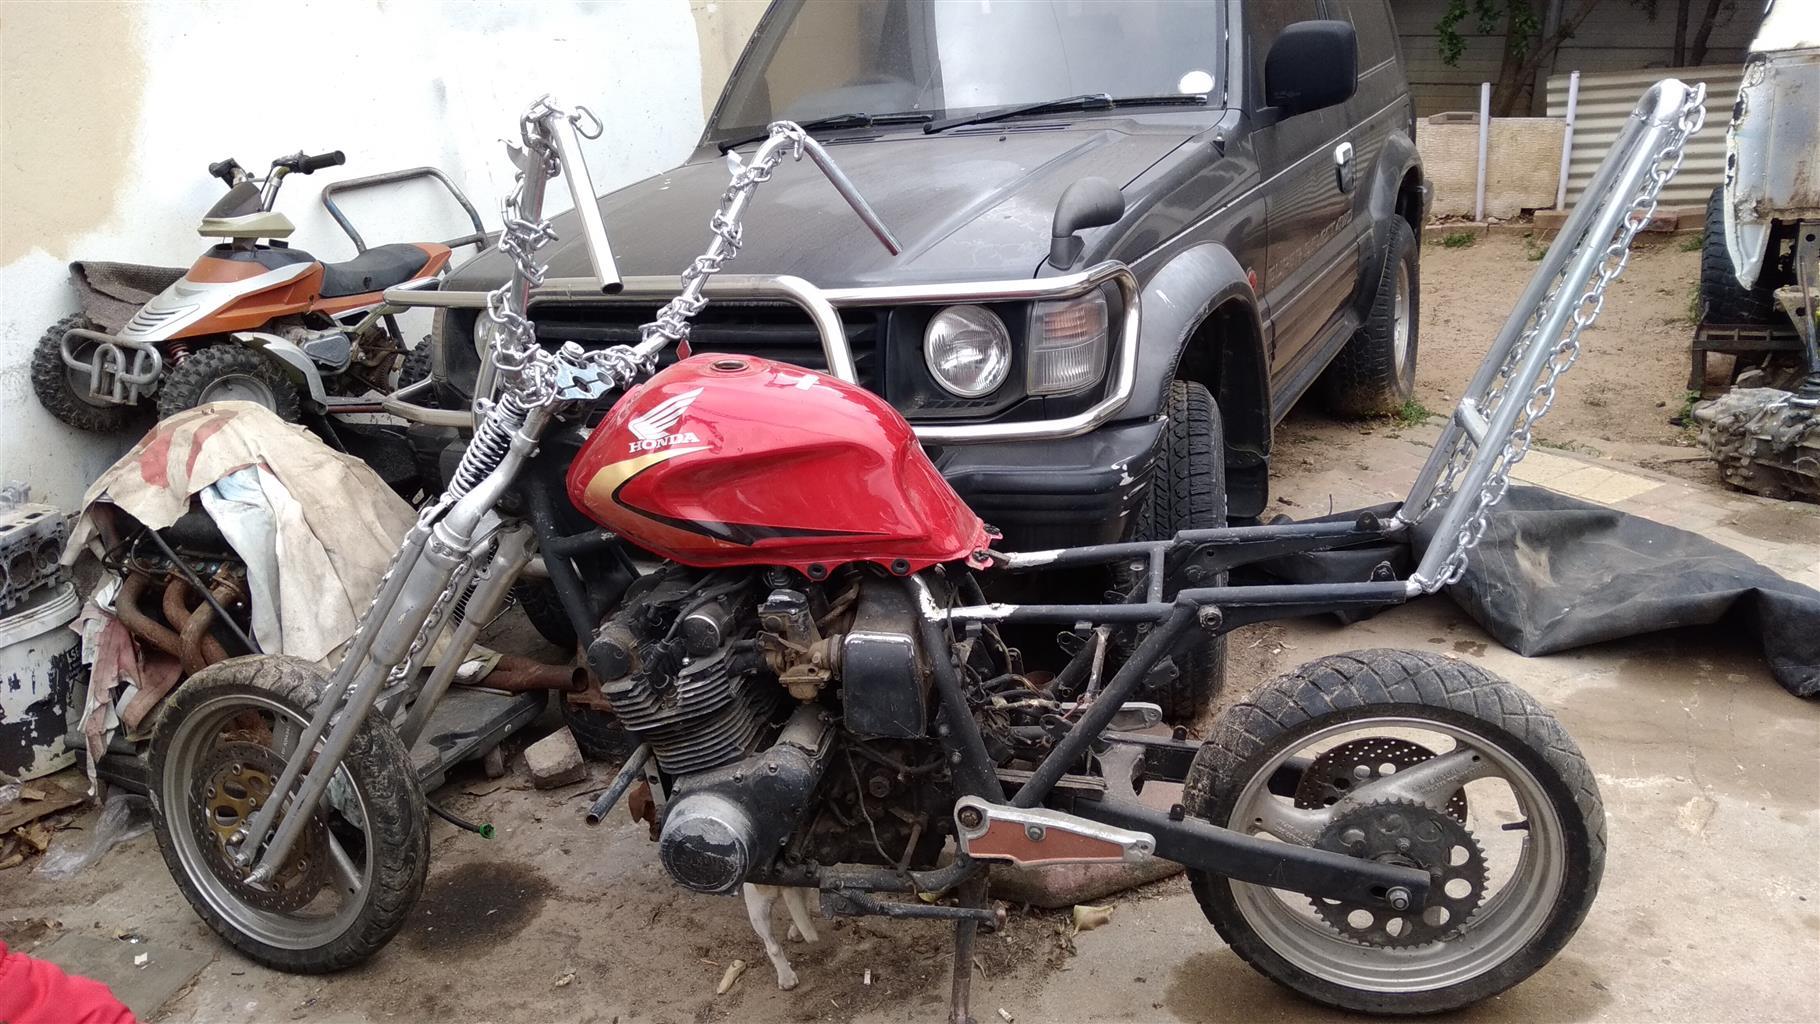 1980 750gs Suzuki Chopper project